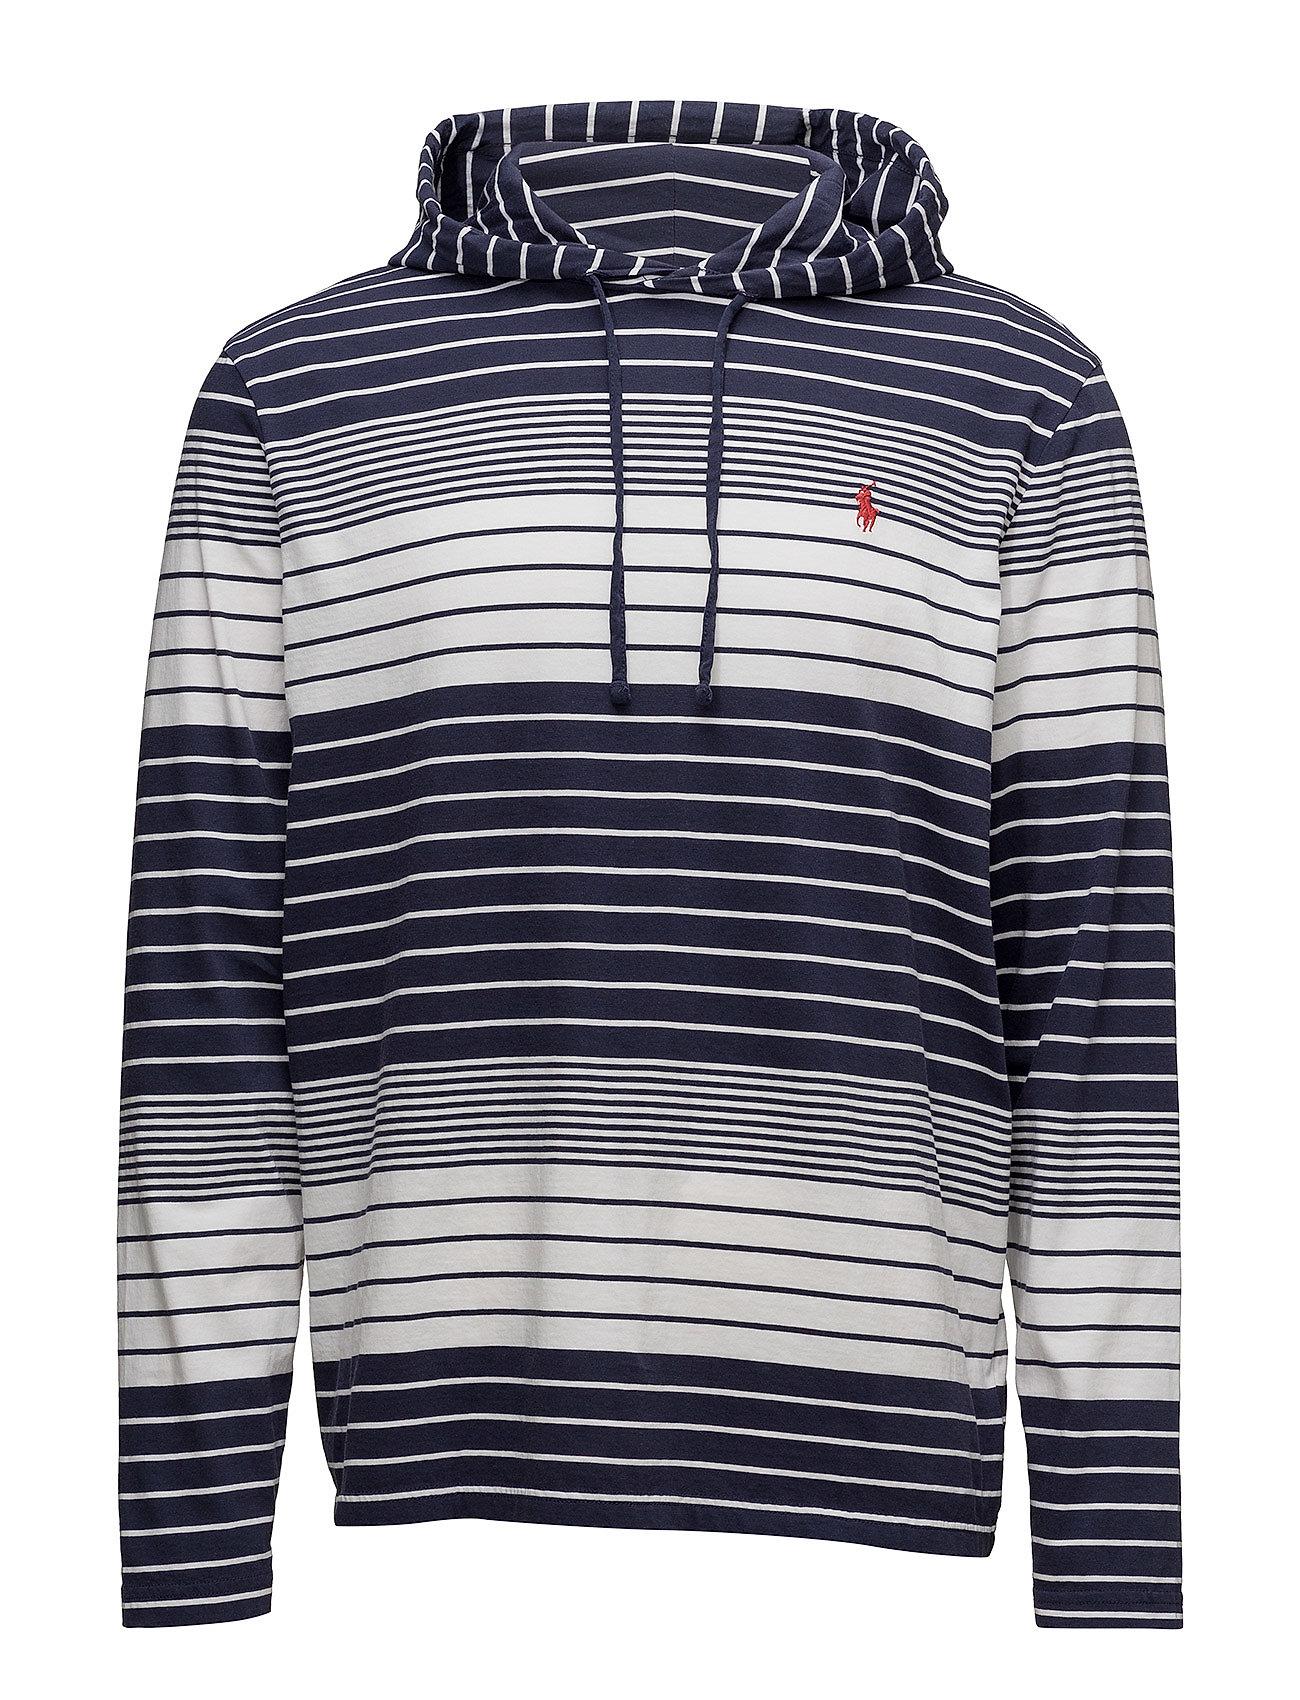 polo ralph lauren striped hoodie.